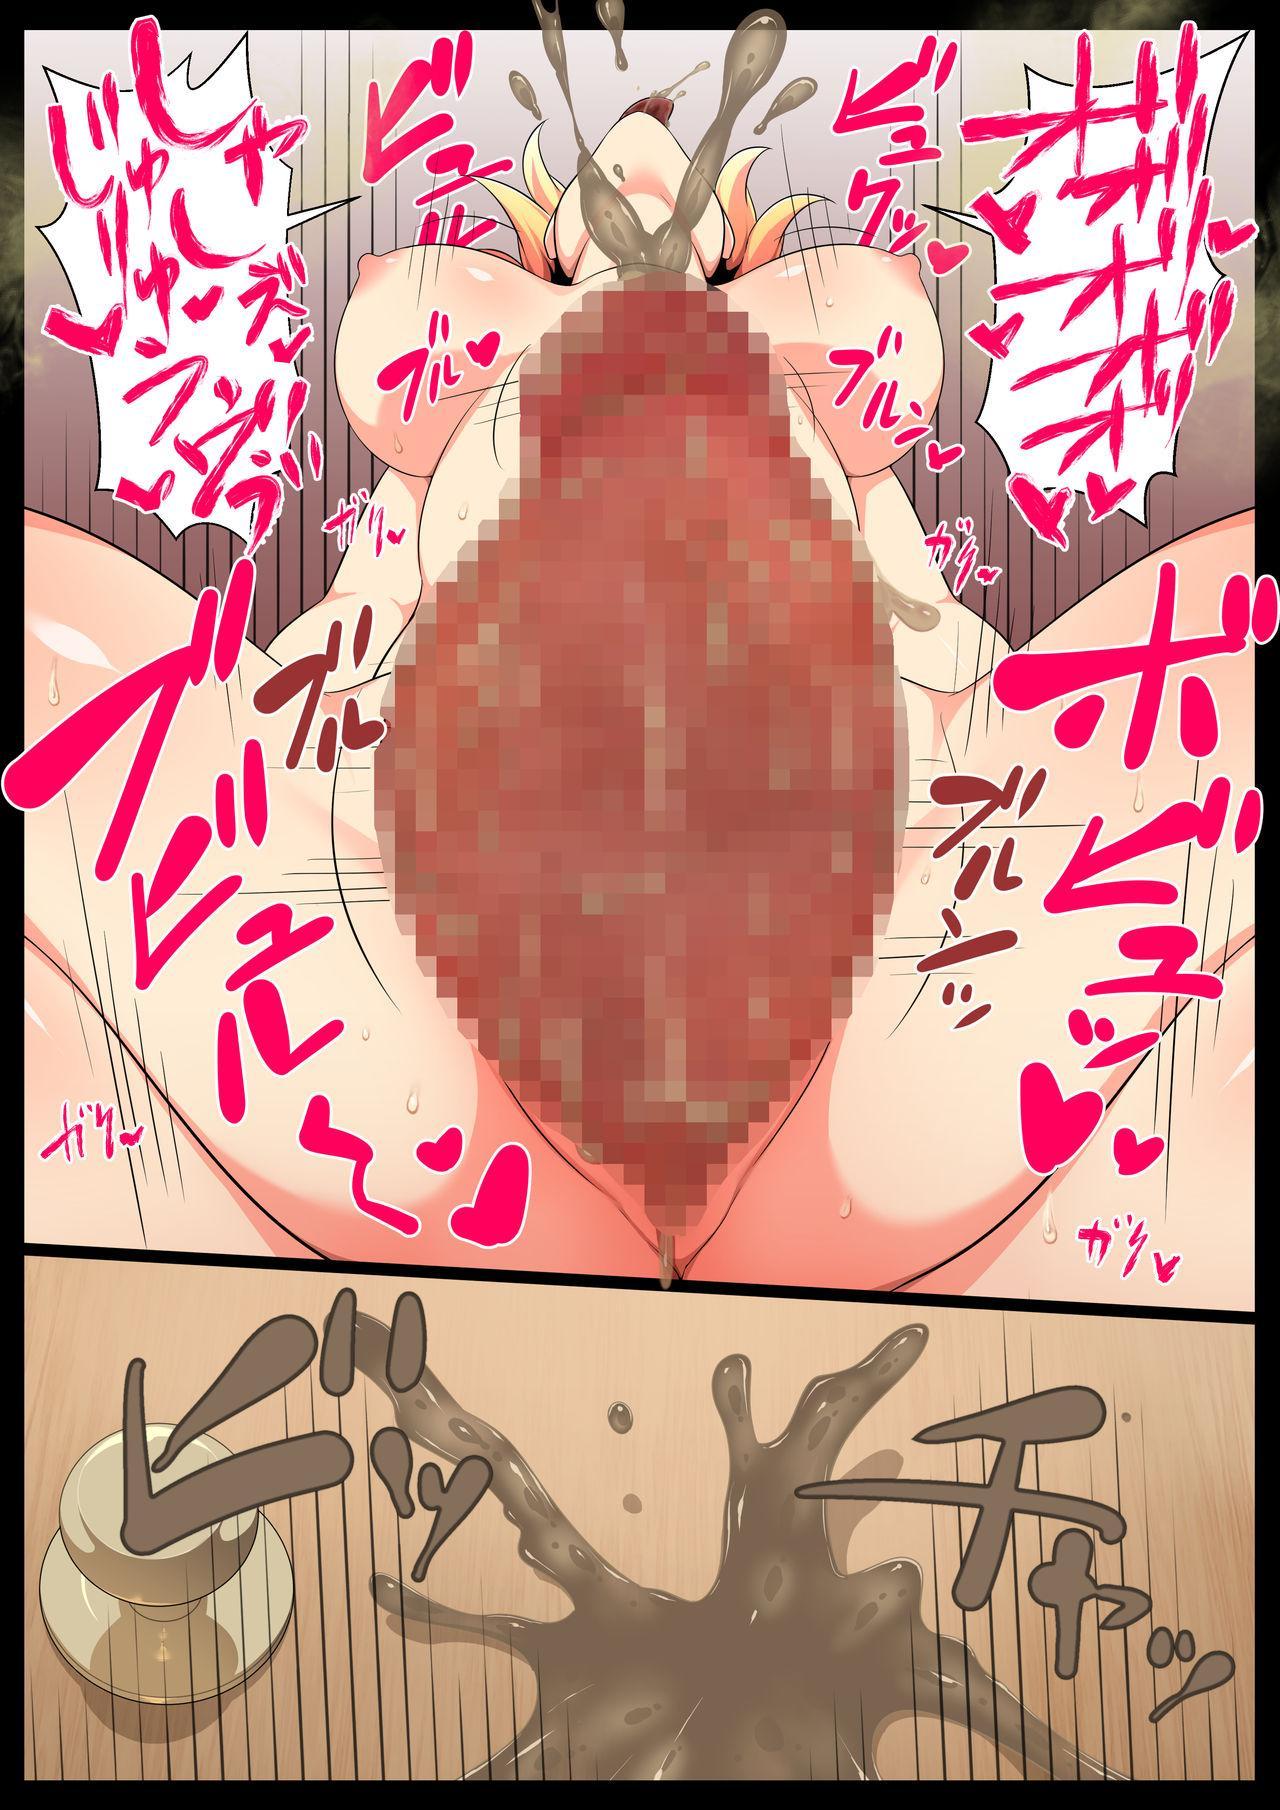 Uchigawa kara Niku o Yogosu 2/Defiling From the Inside 18